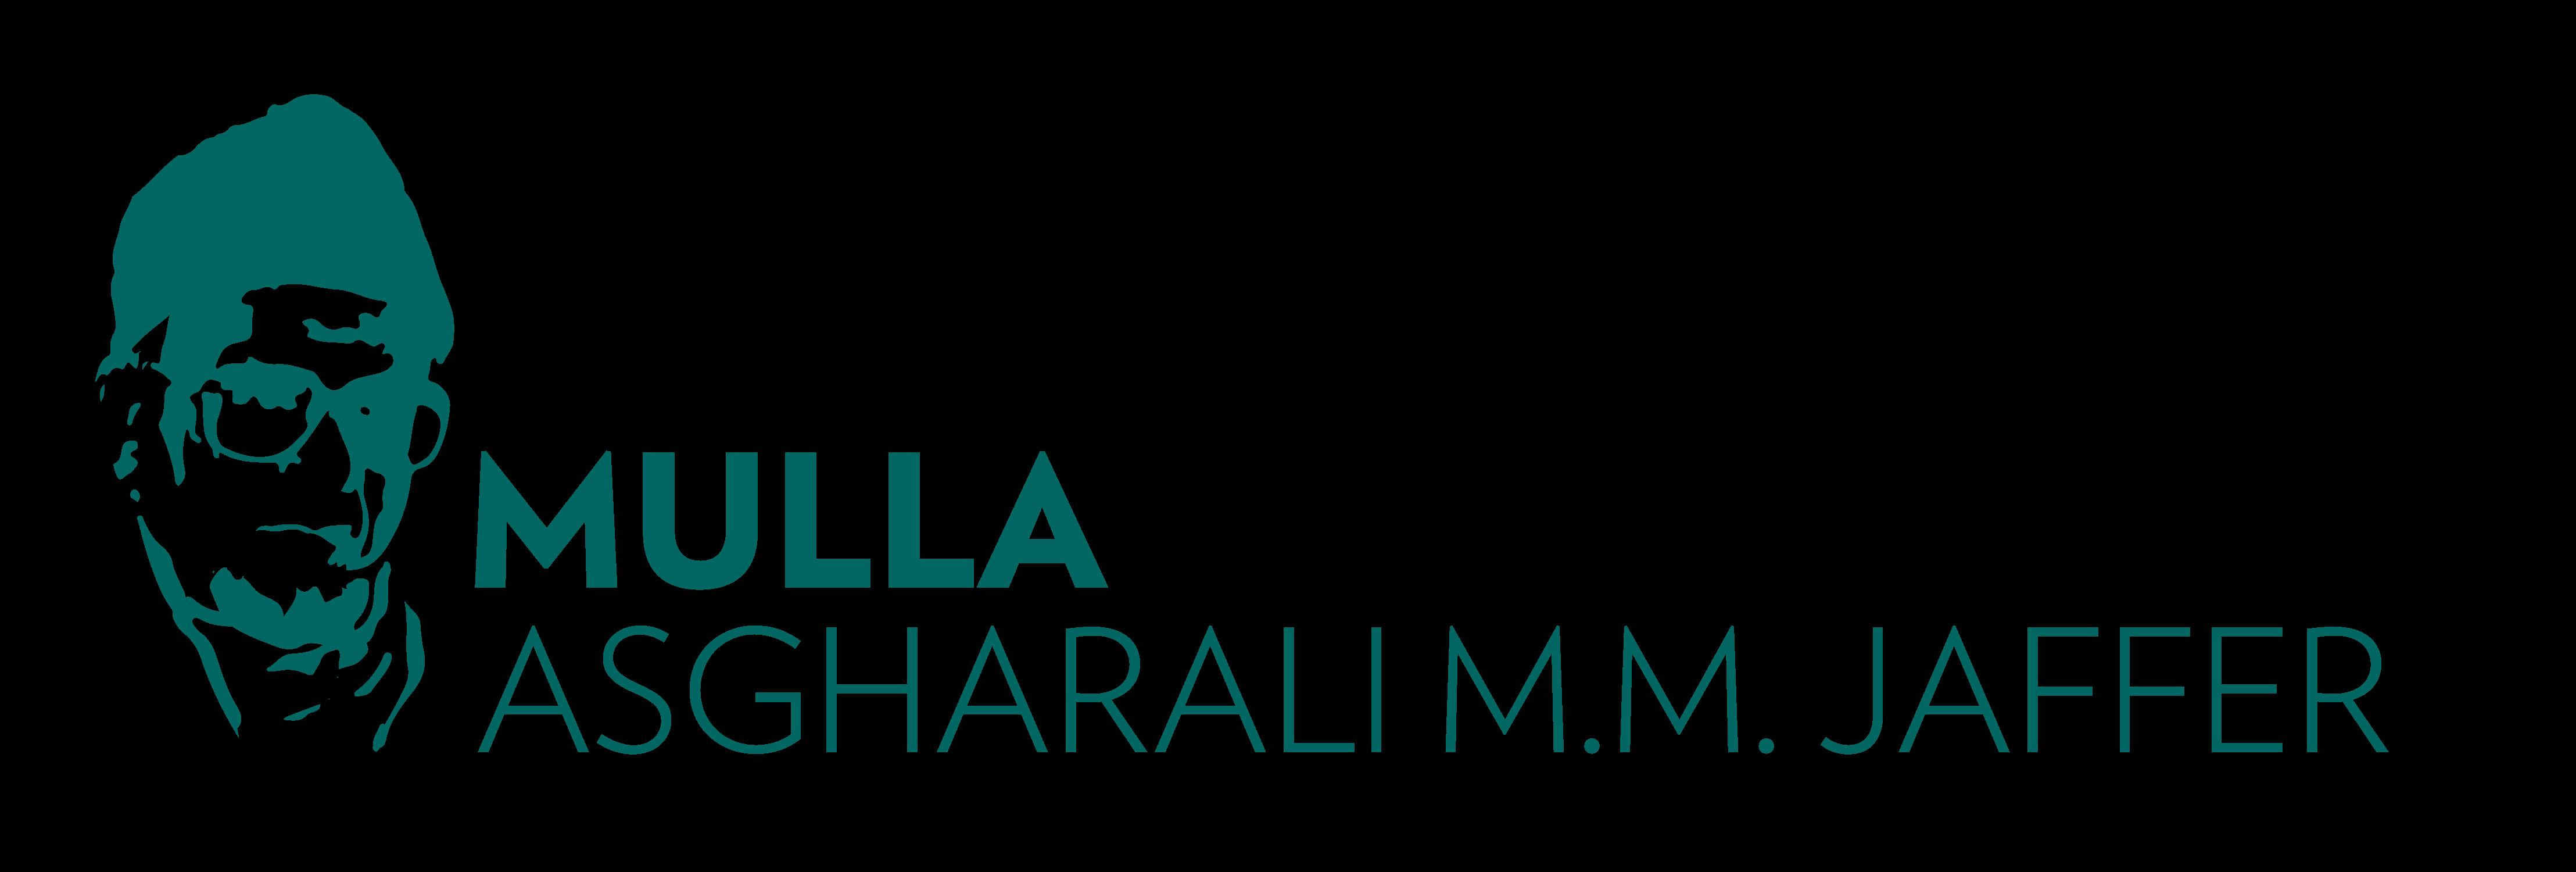 Mulla Asgharali M.M. Jaffer